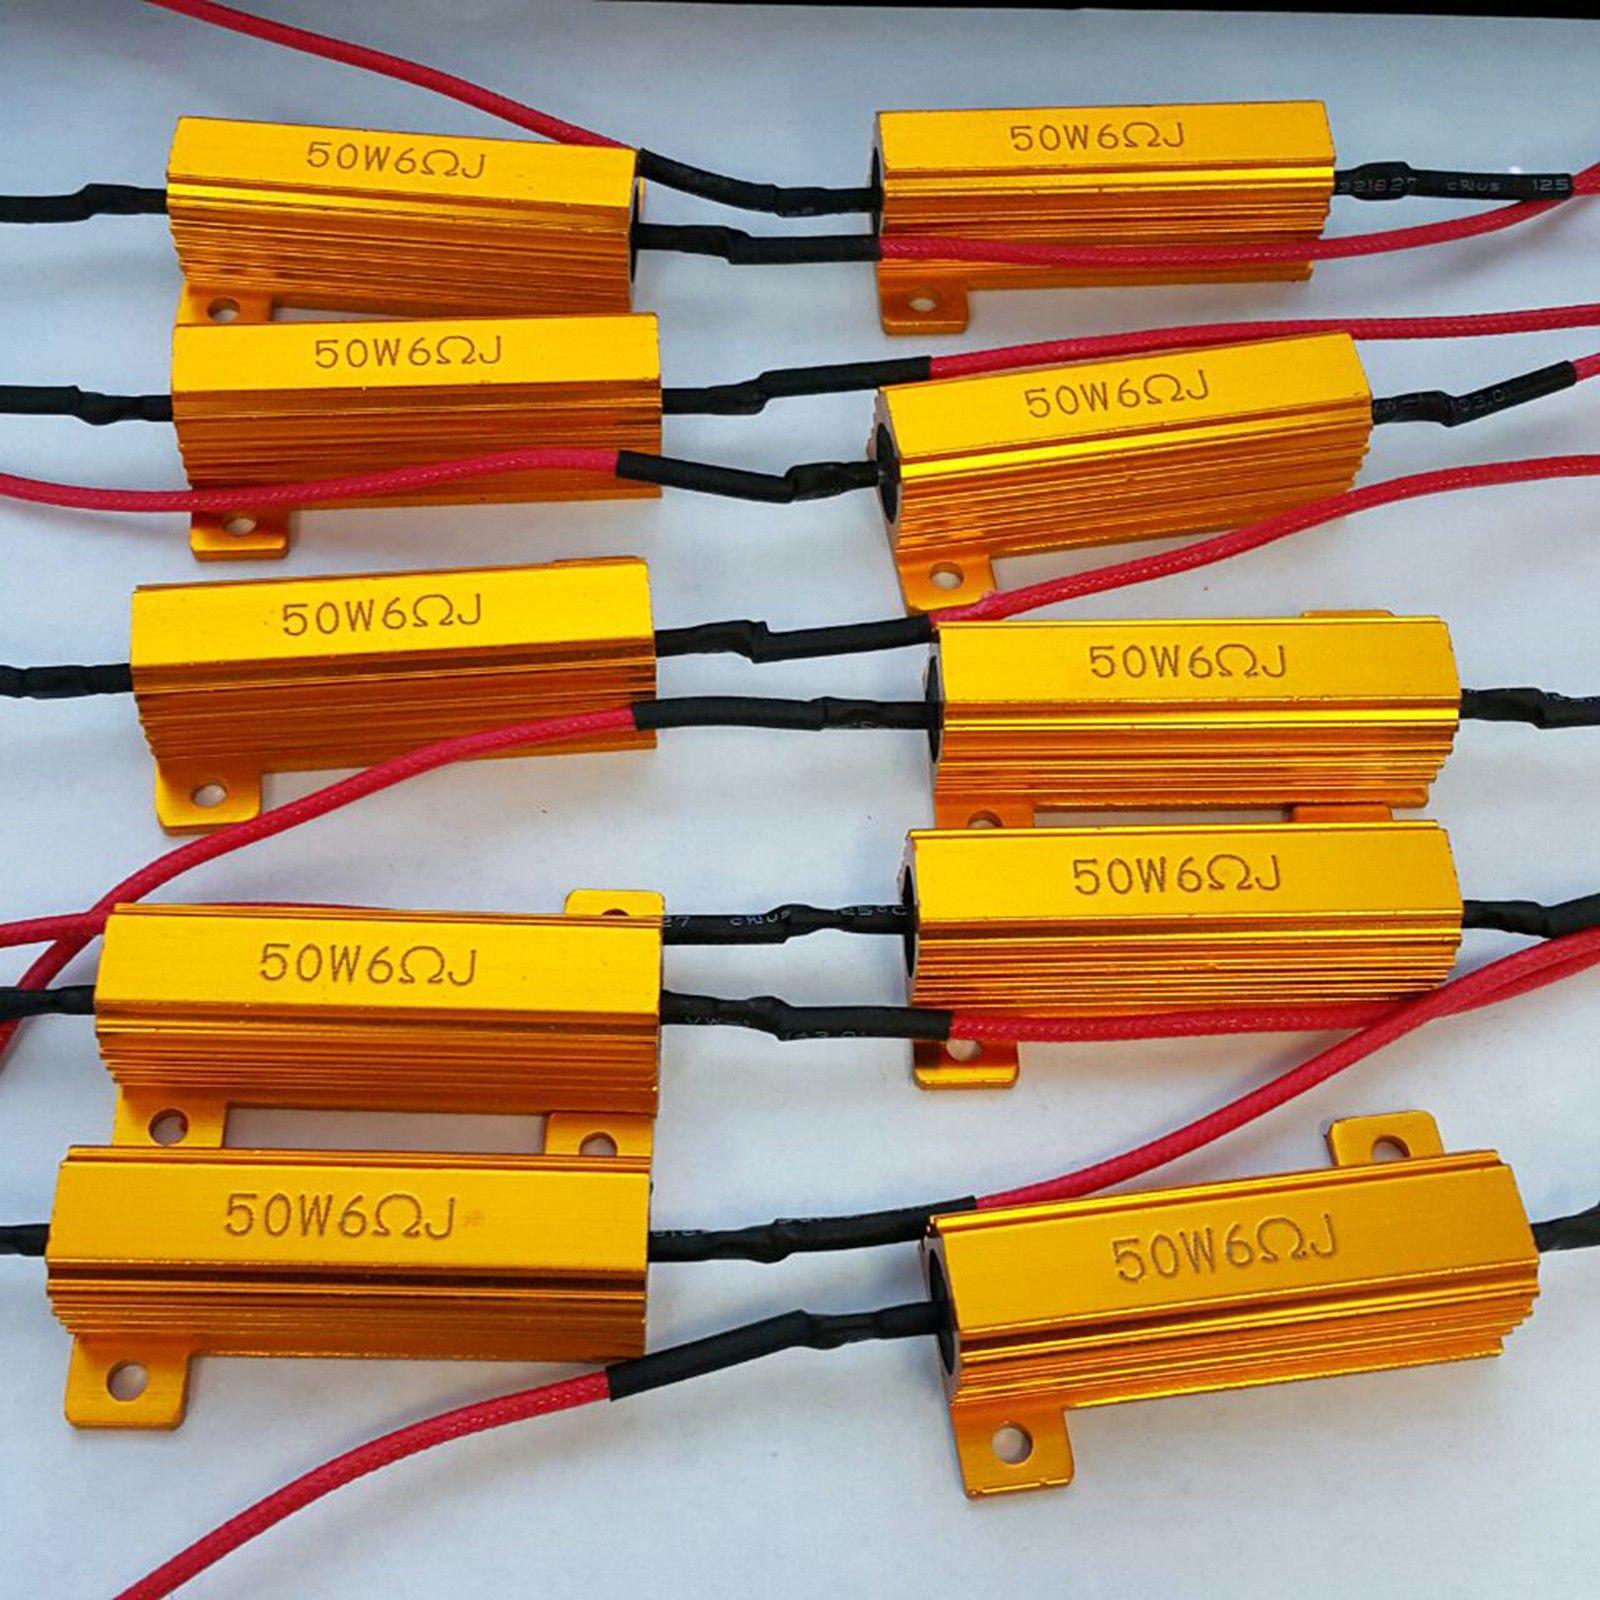 LED Load Resistor 50W 6 ohm - LED Turn Signal Resistor Flasher - Fix LED Bulb Fast Hyper Flash Turn Signal Blink Error Code (10 pcs) by OsramMotor